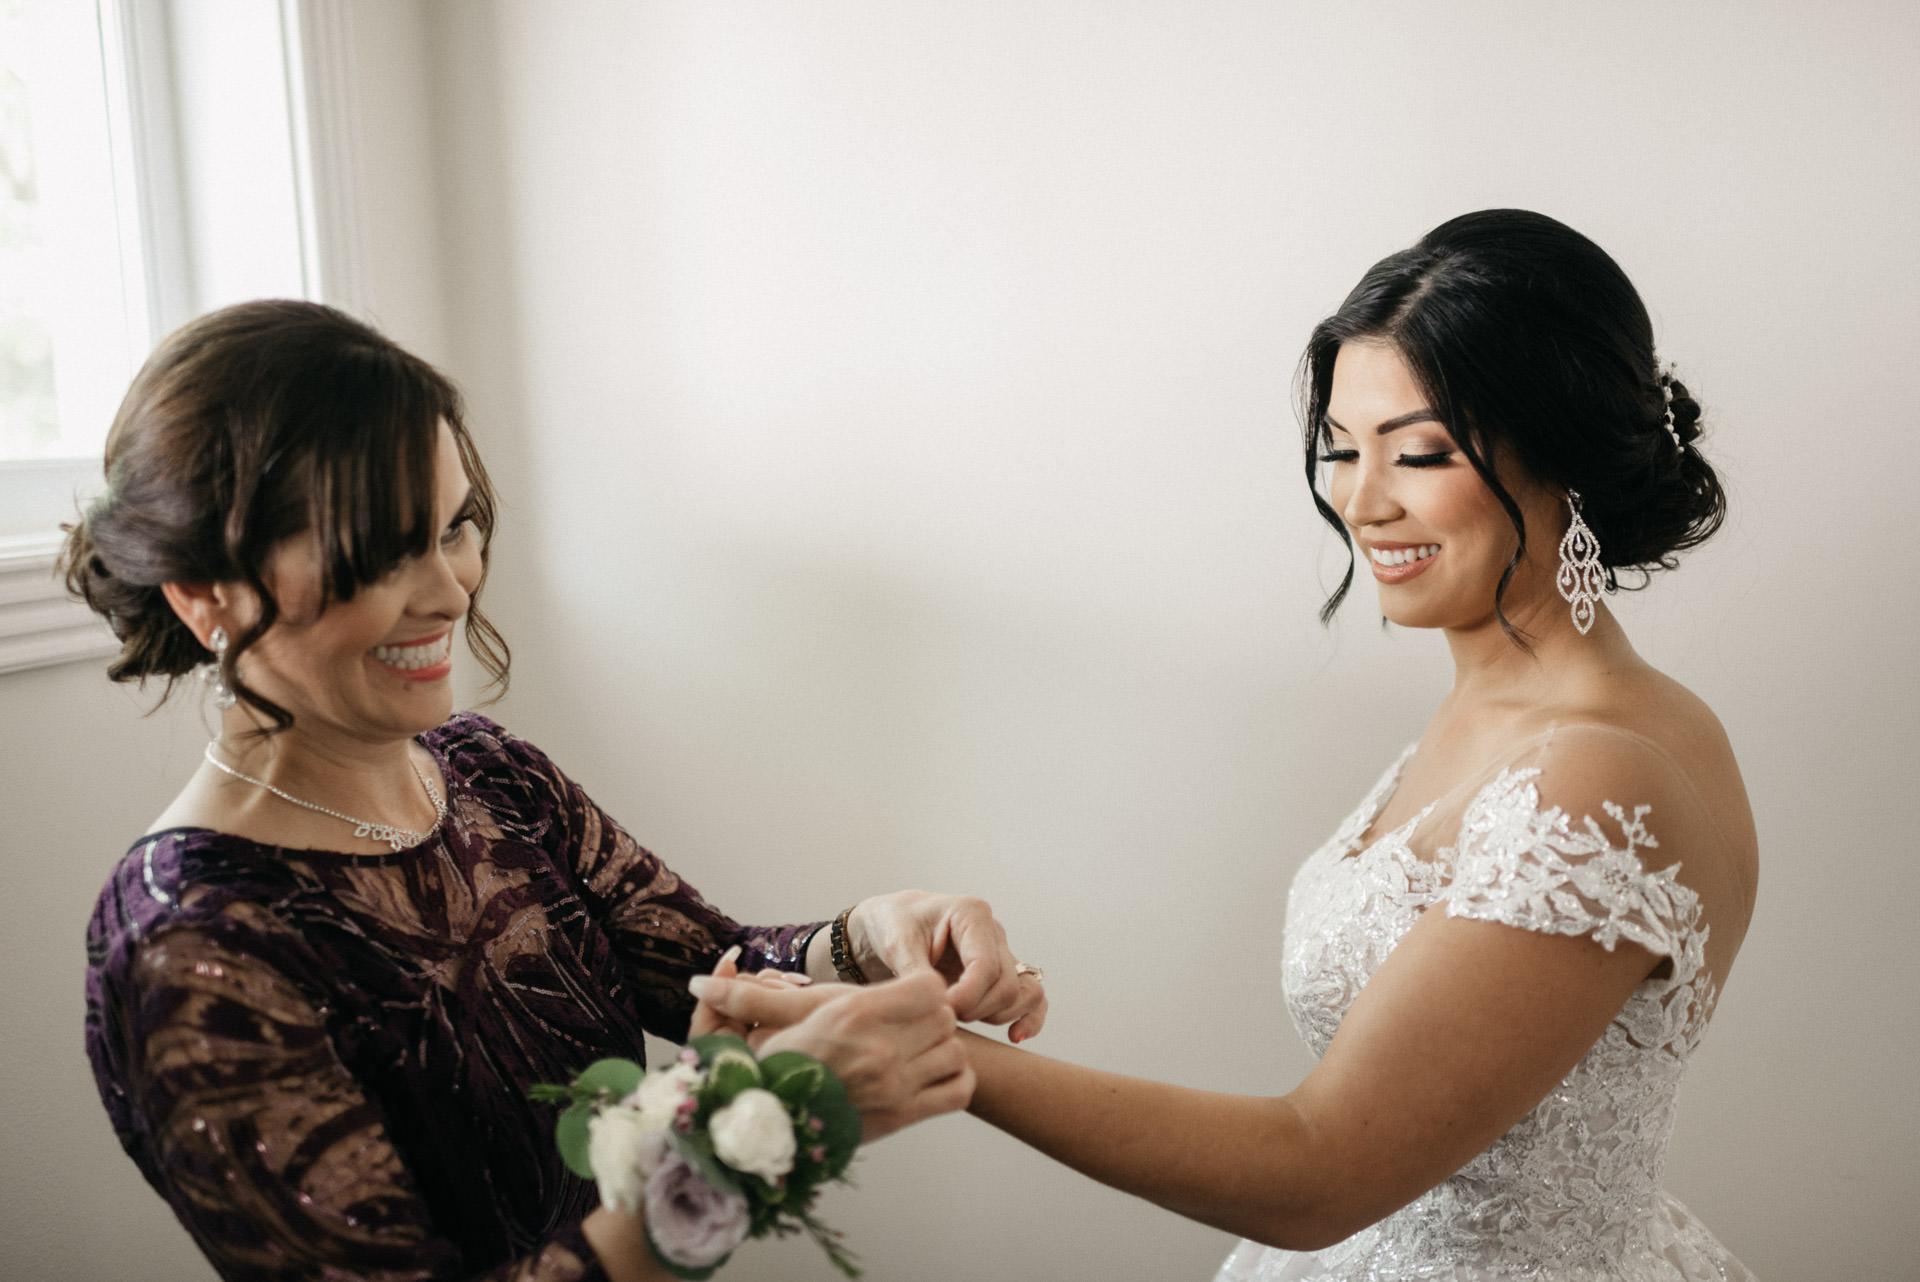 lexi-michael-wedding-blog-sm-24.jpg